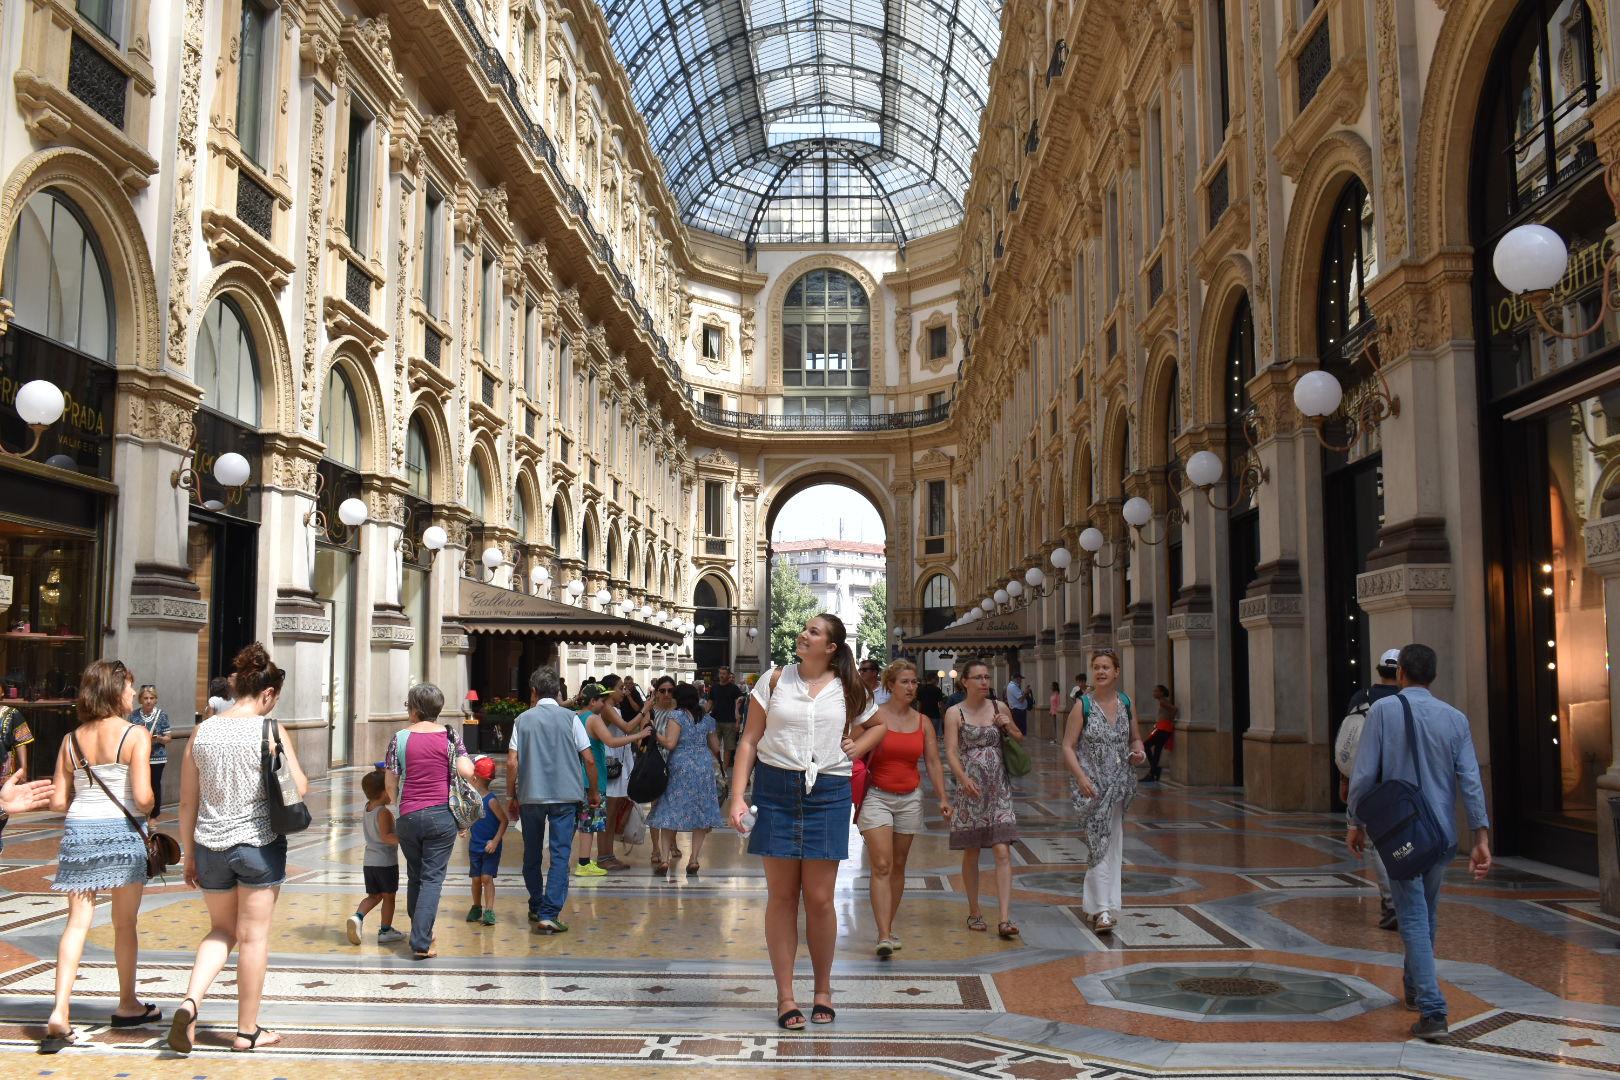 Exploring Markets Abroad